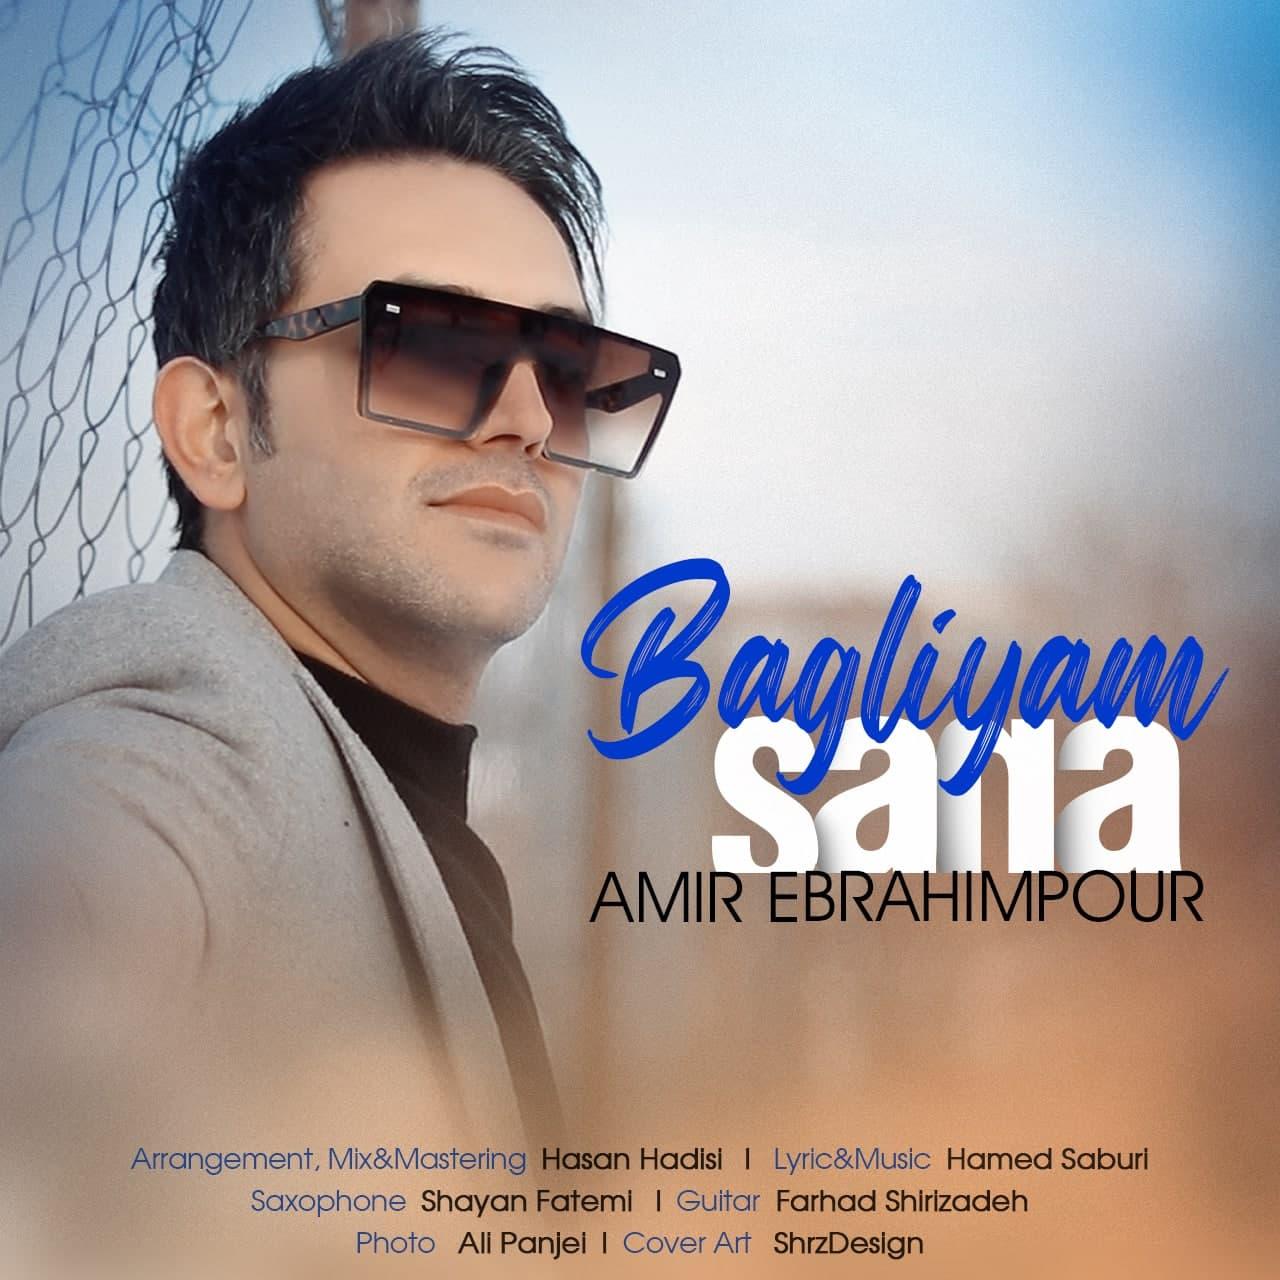 https://s17.picofile.com/file/8428799026/02Amir_Ebrahimpour_Bagliyam_Sana.jpg